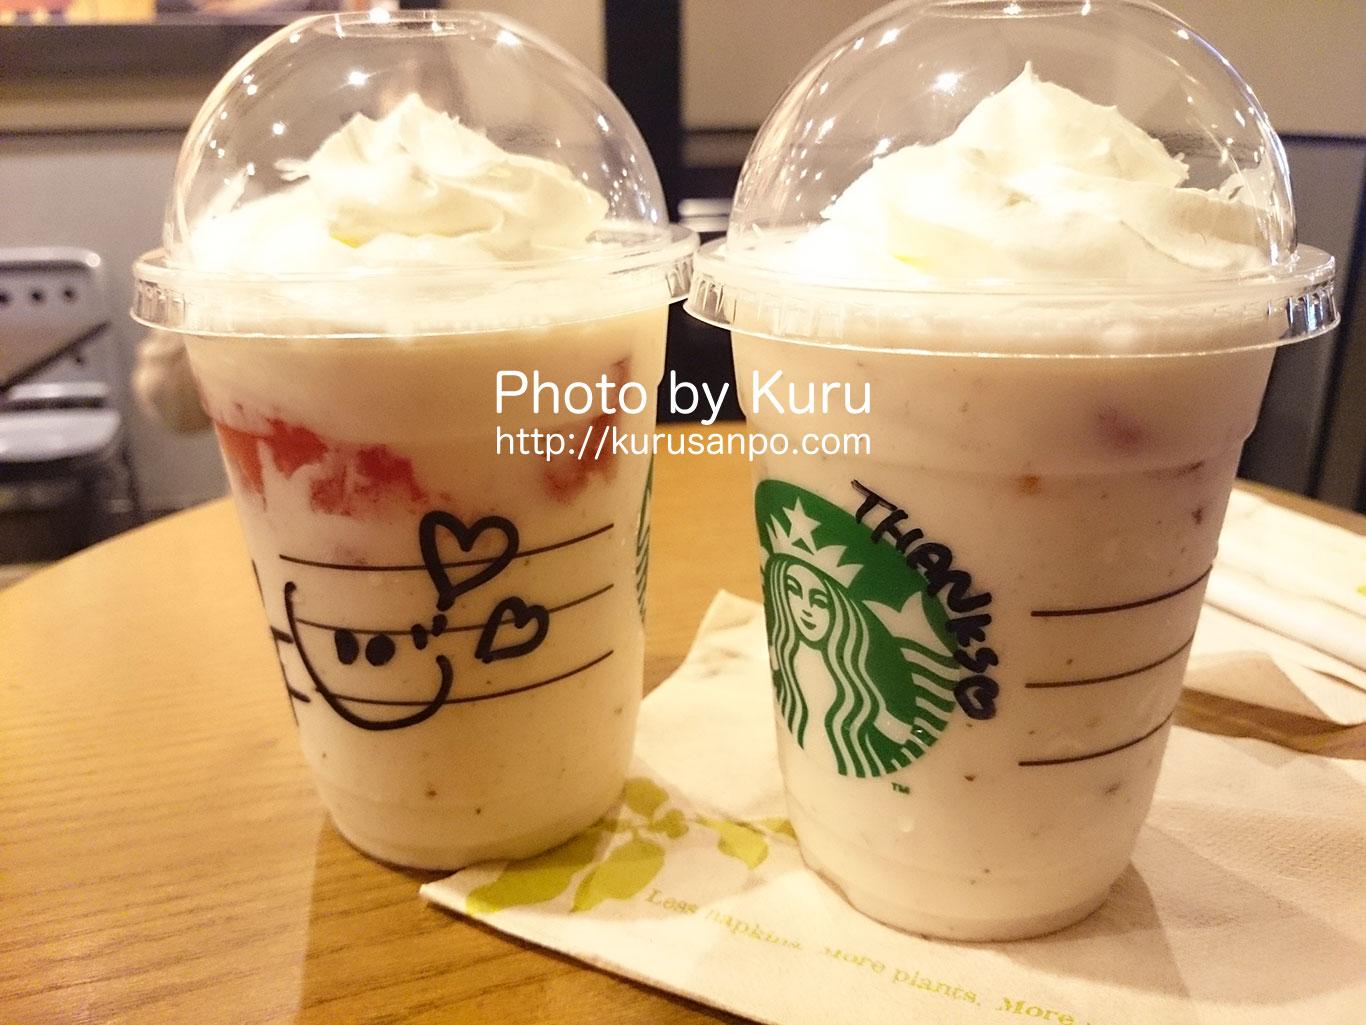 STARBUCKS COFFEE(スターバックスコーヒー)『フルーツ・オン・トップ ヨーグルトフラペチーノwithクラッシュナッツ』